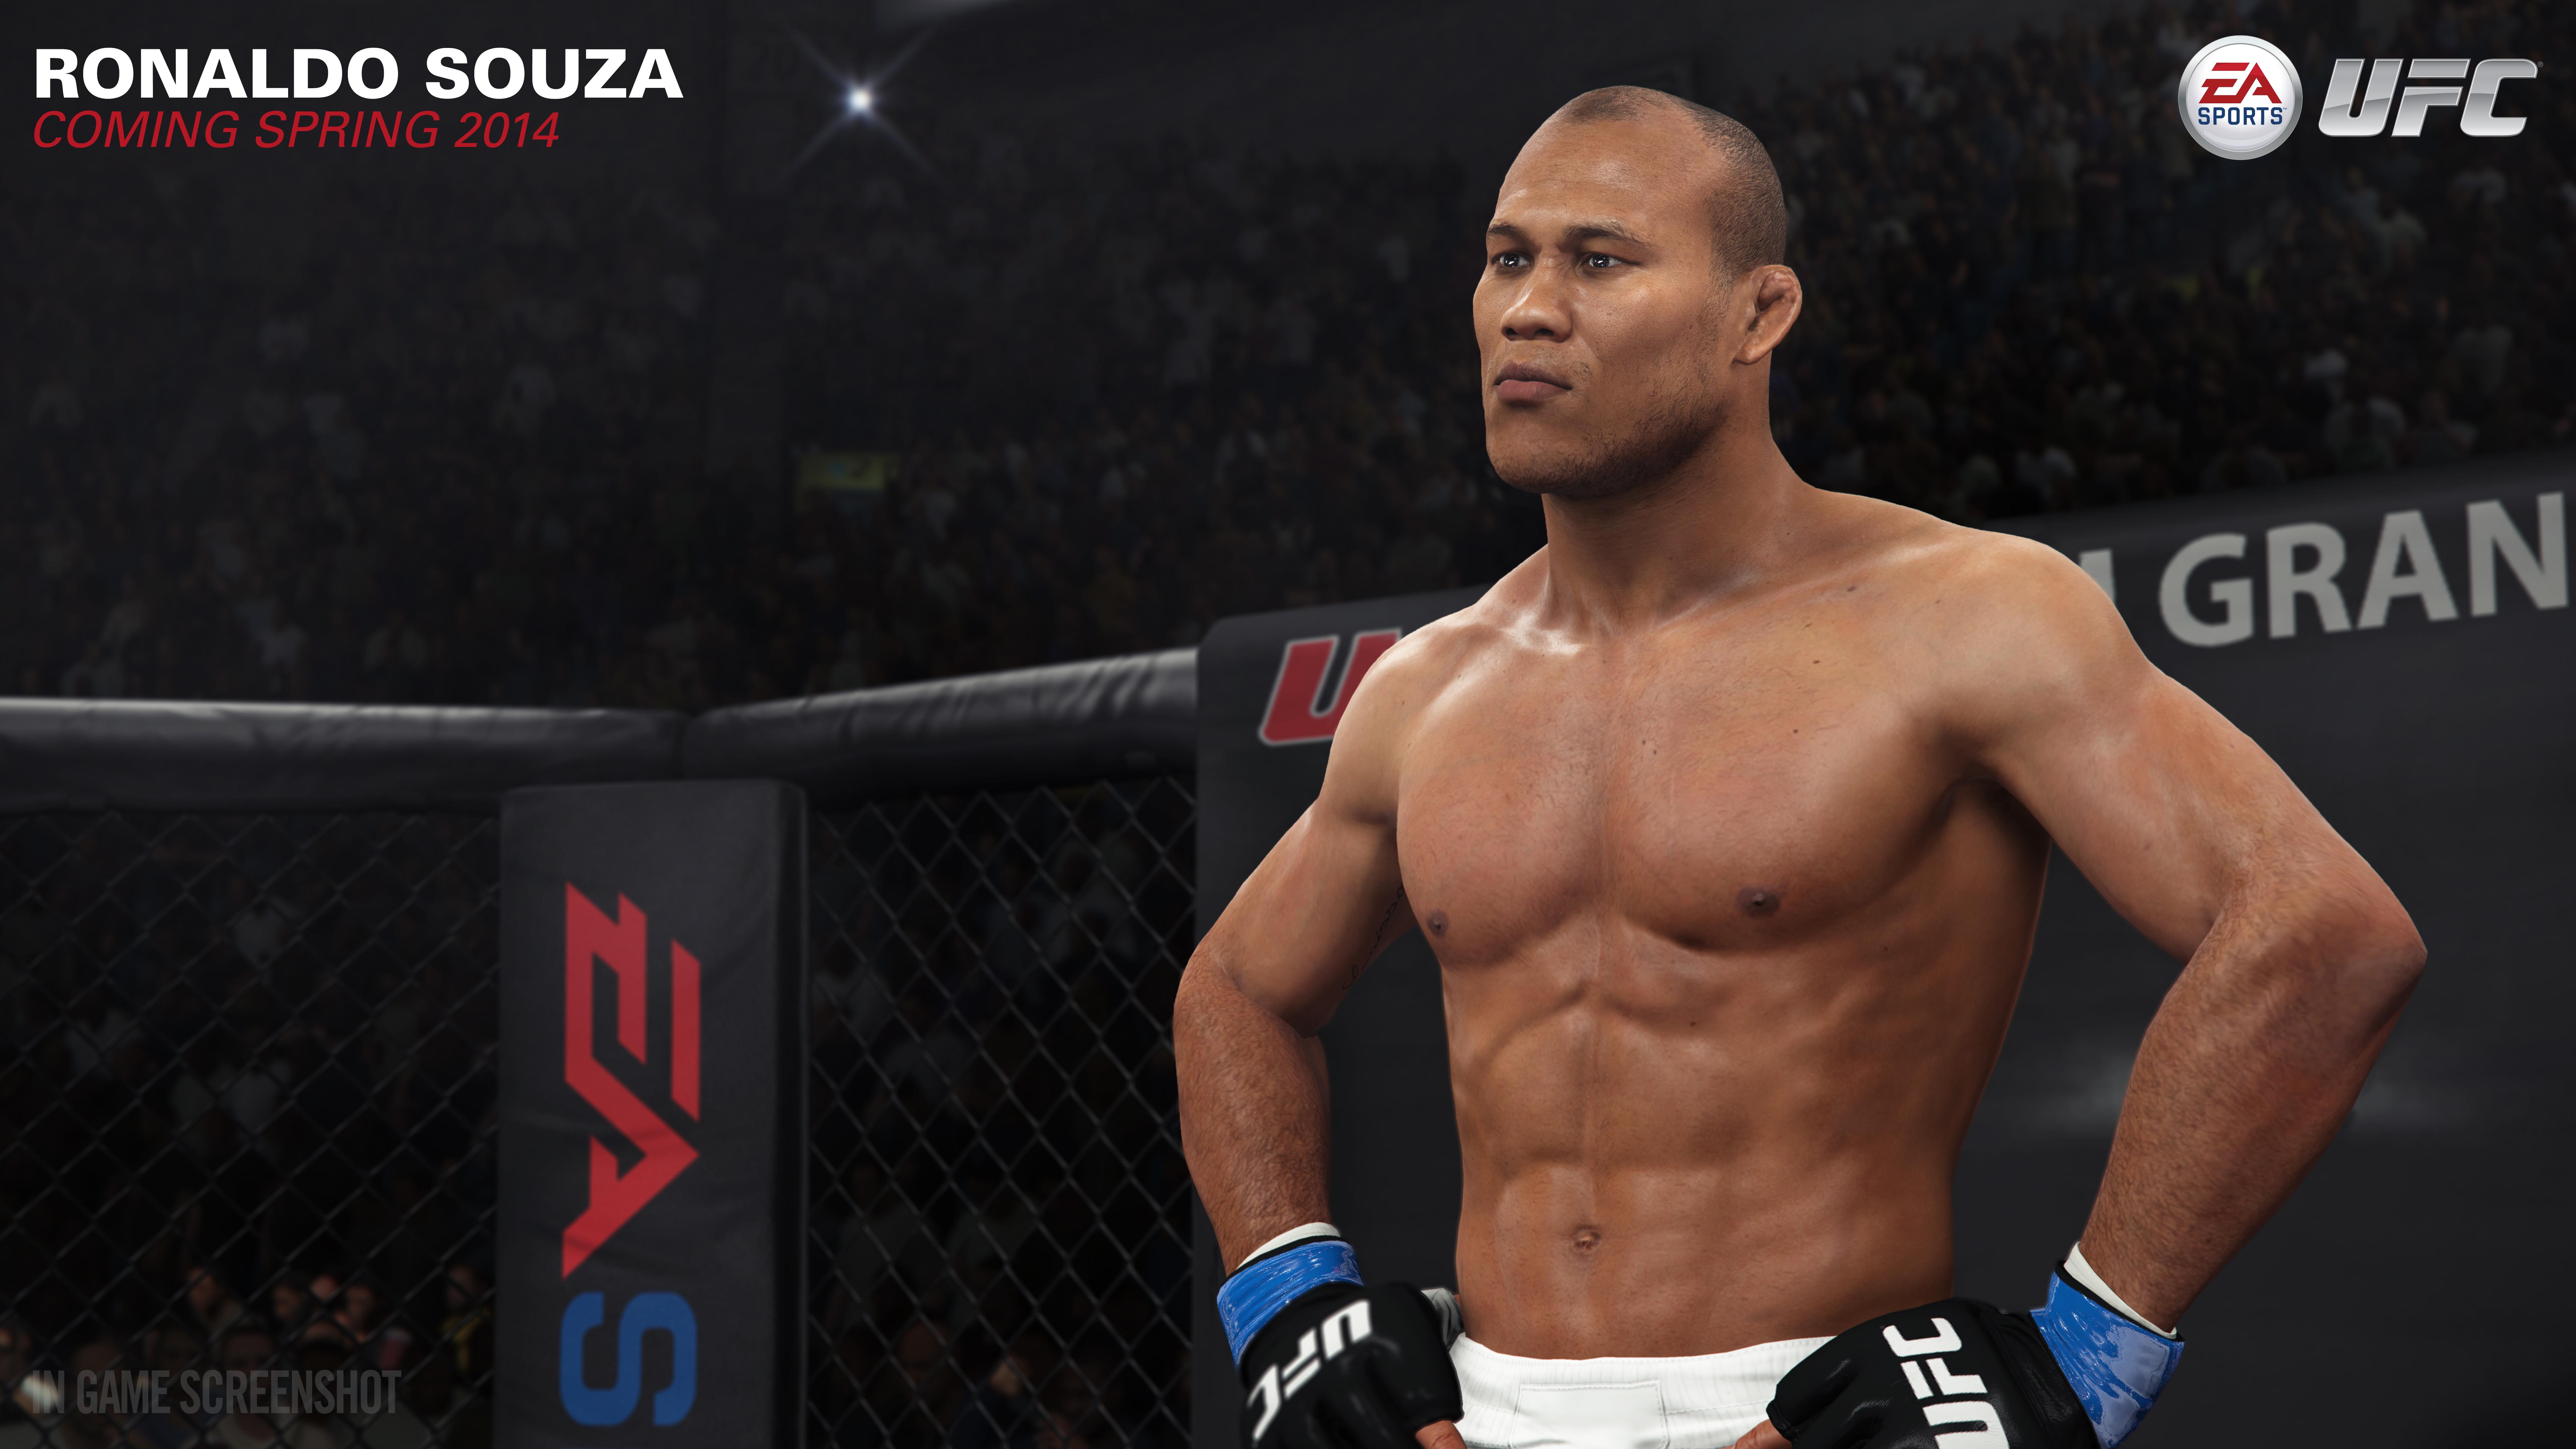 Роналду Соуза - EA Sports UFC 8K